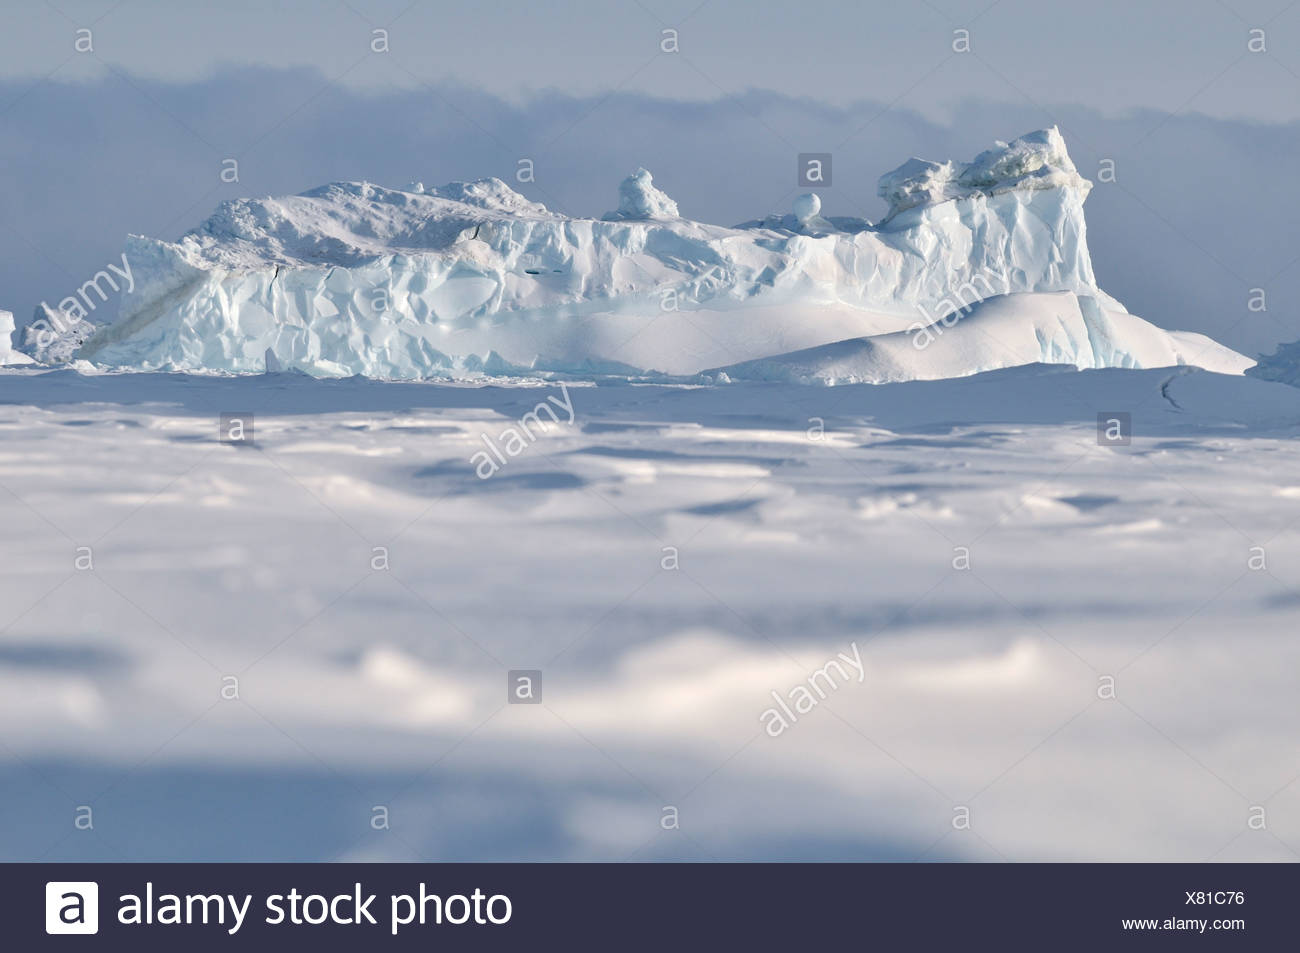 Frozen fjord, Qeqertarsuaq or Disko Island, Greenland, Arctic North America - Stock Image